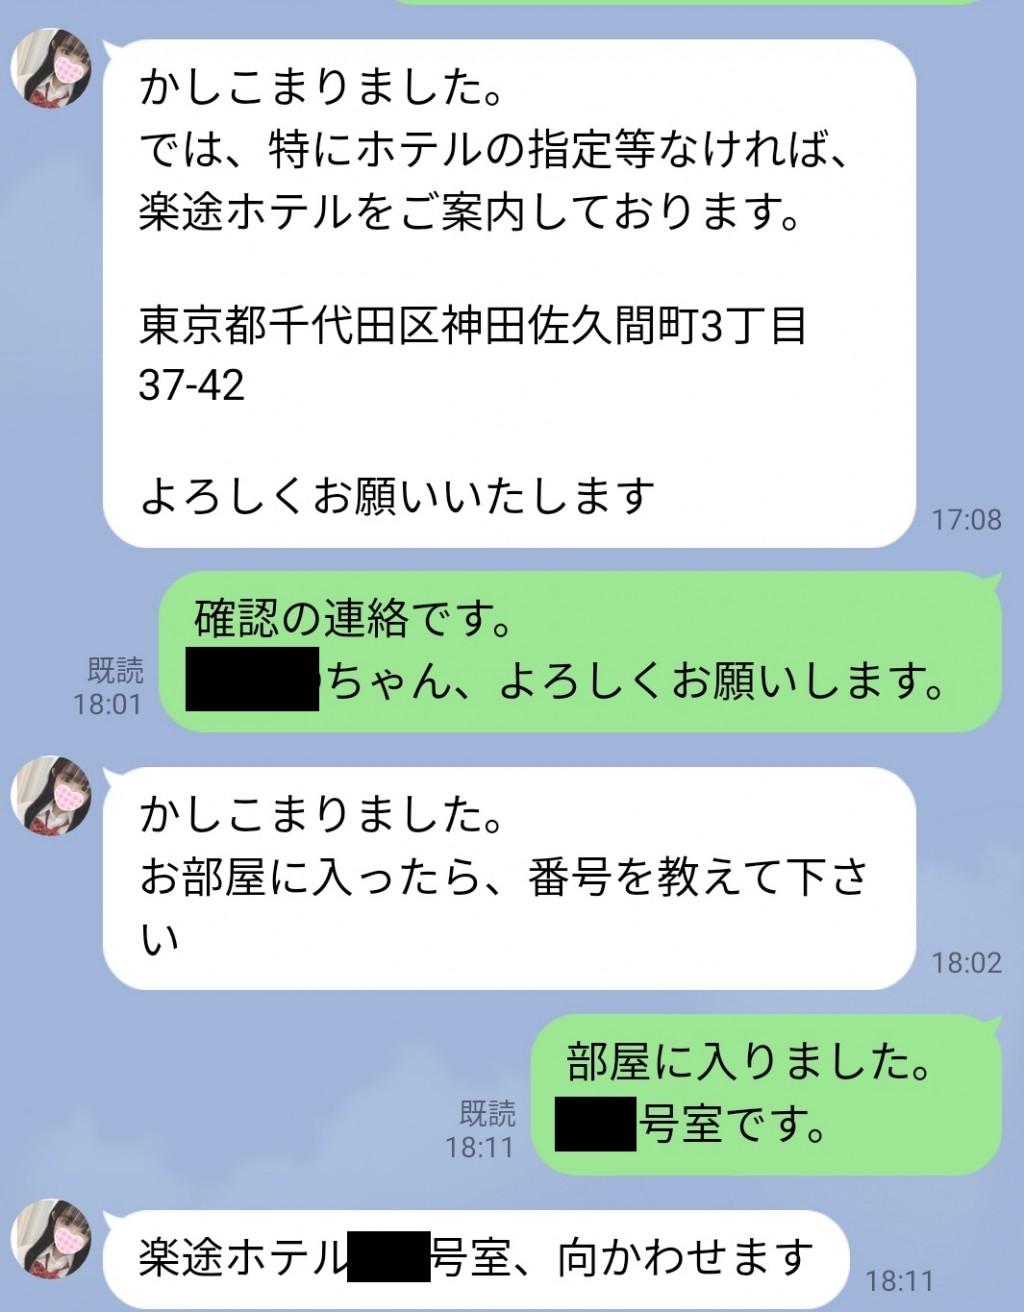 JKリフレを予約する際のLINE②